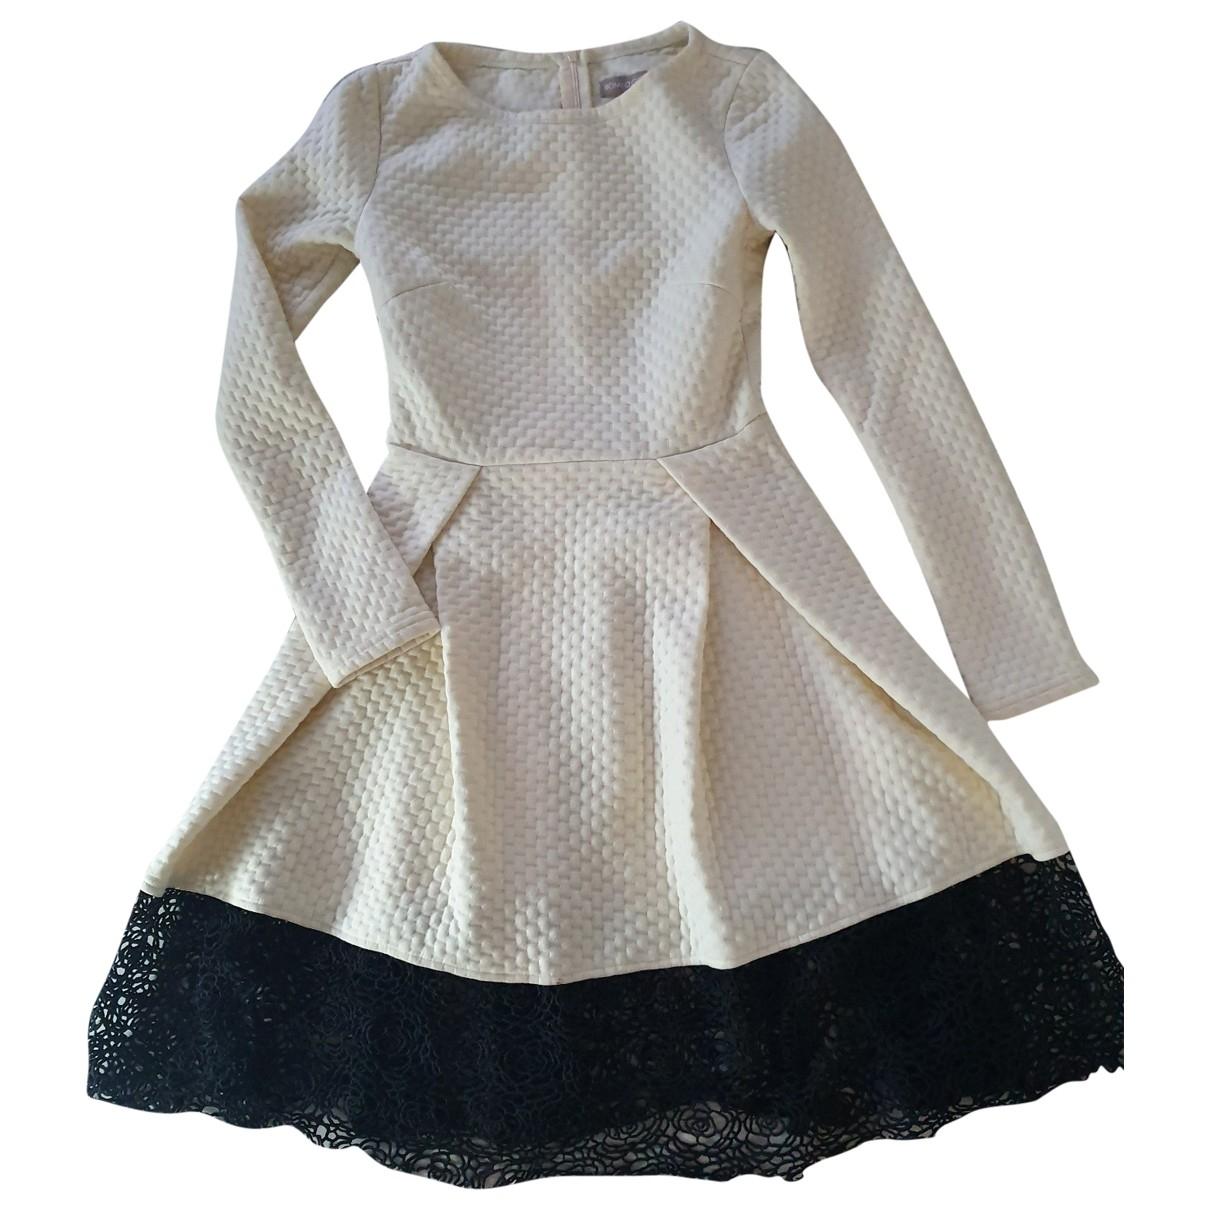 Romeo Gigli \N White dress for Women XS International